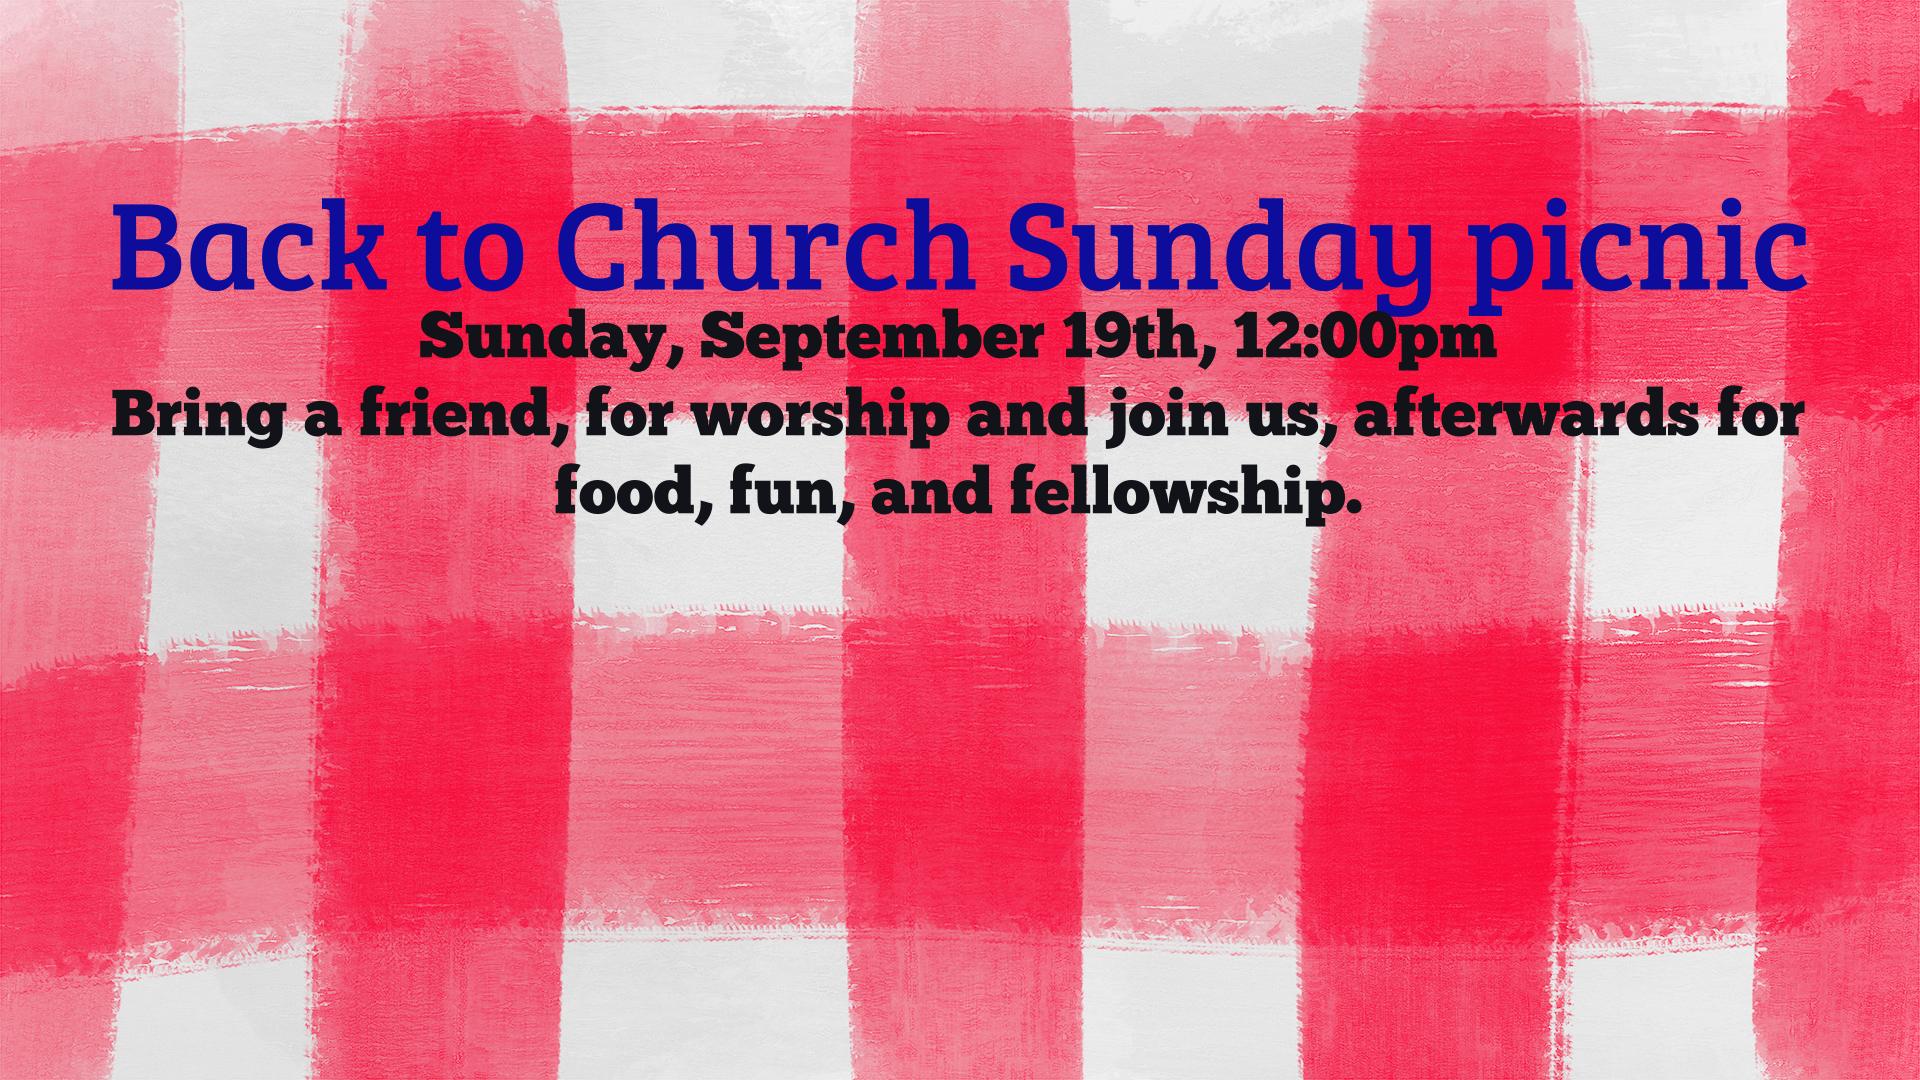 Back to Church Sunday picnic